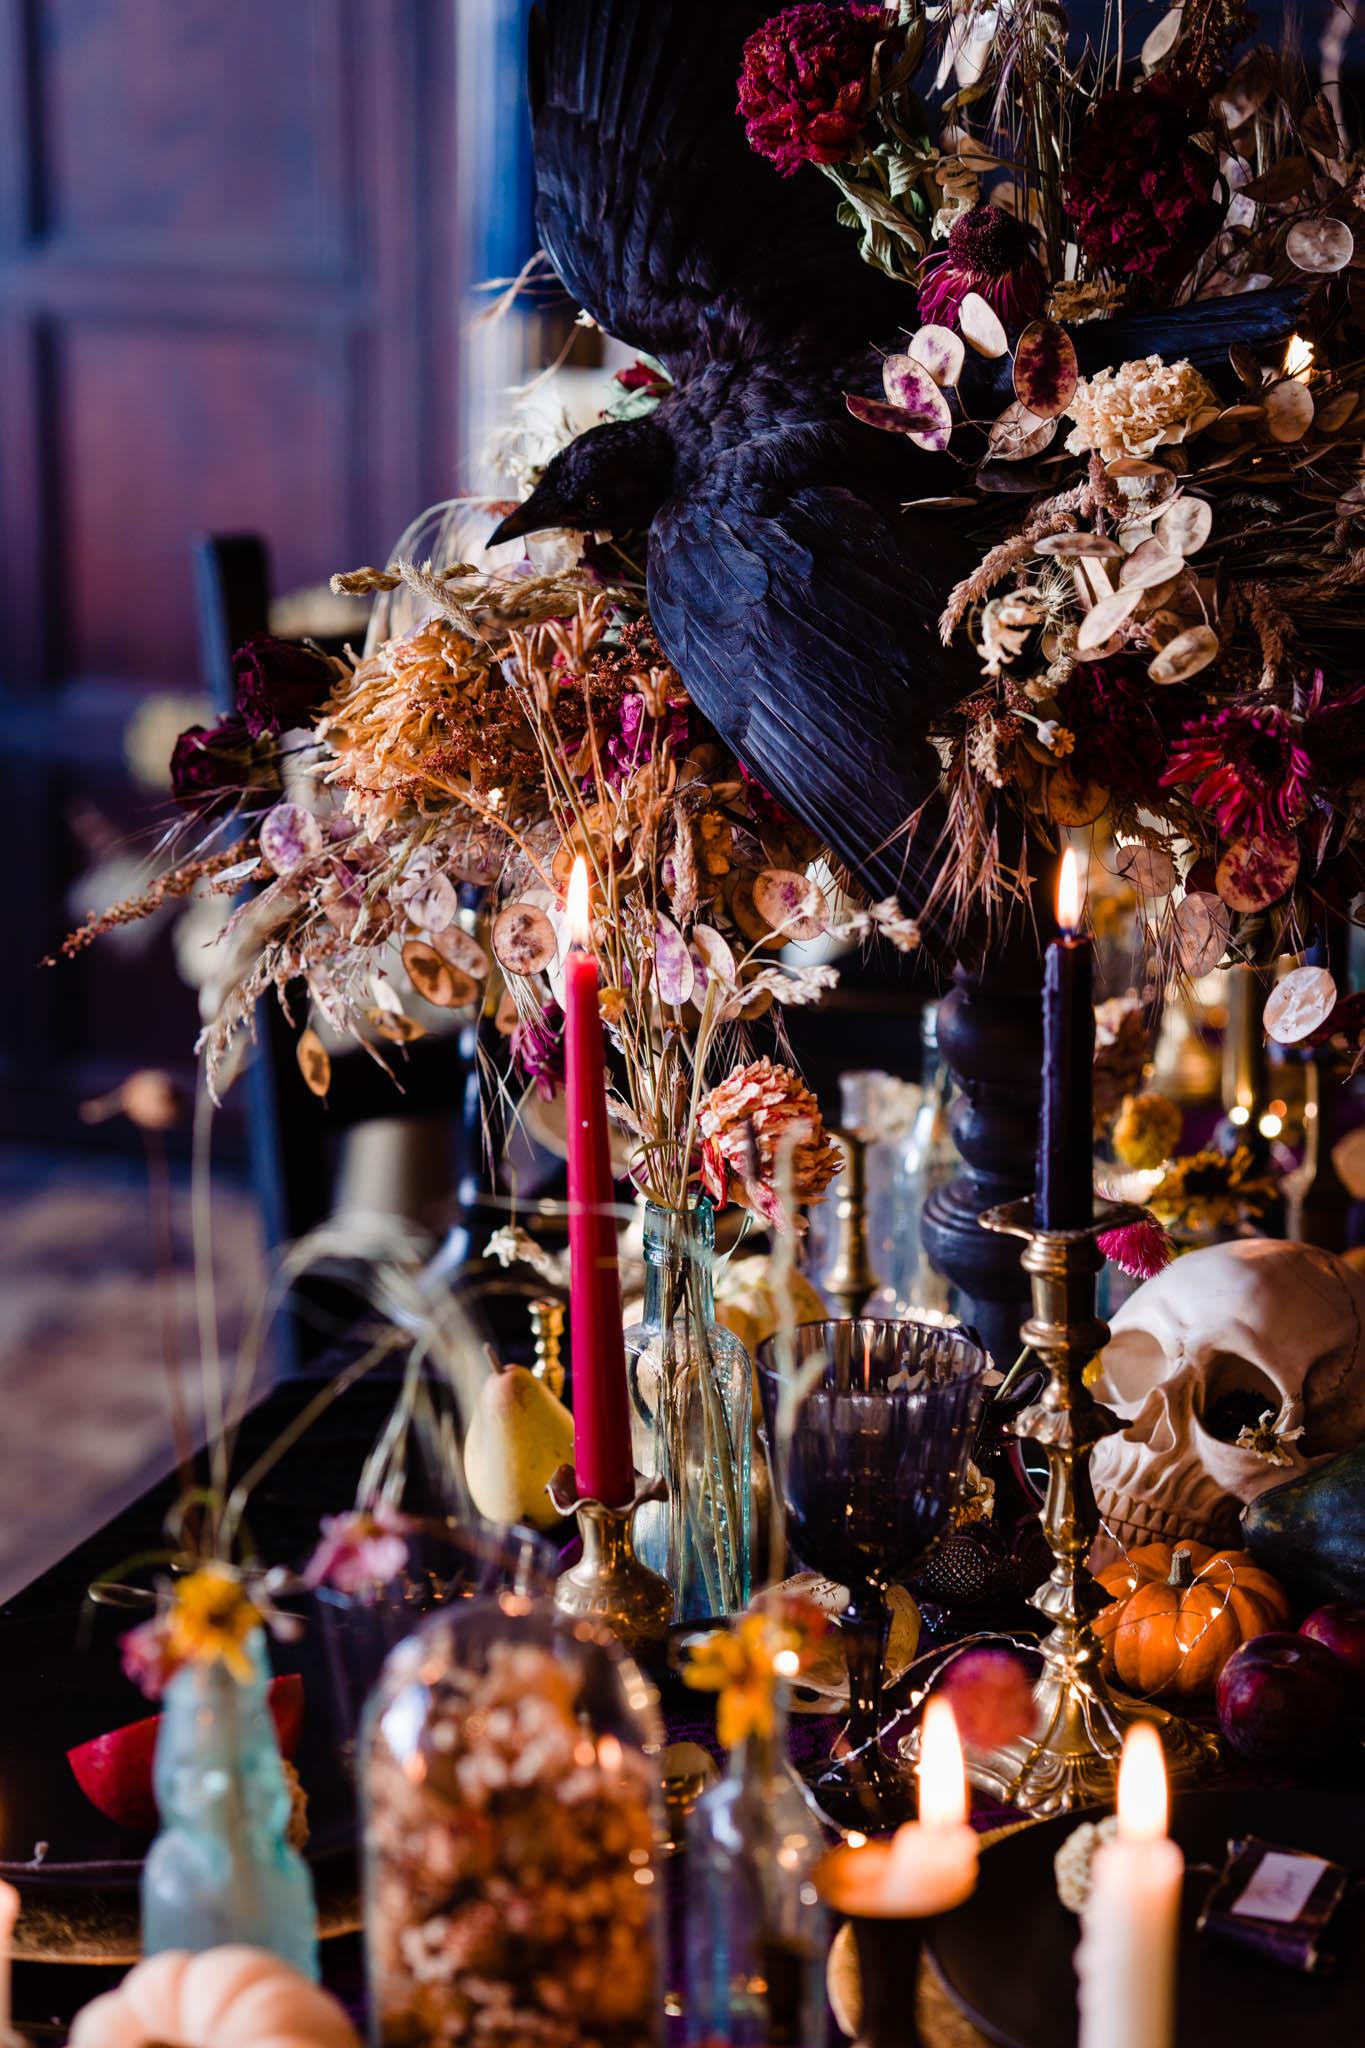 eclectic wedding decor with taxidermy crow - elegant gothic wedding - gothic wedding - halloween wedding - autumn wedding -